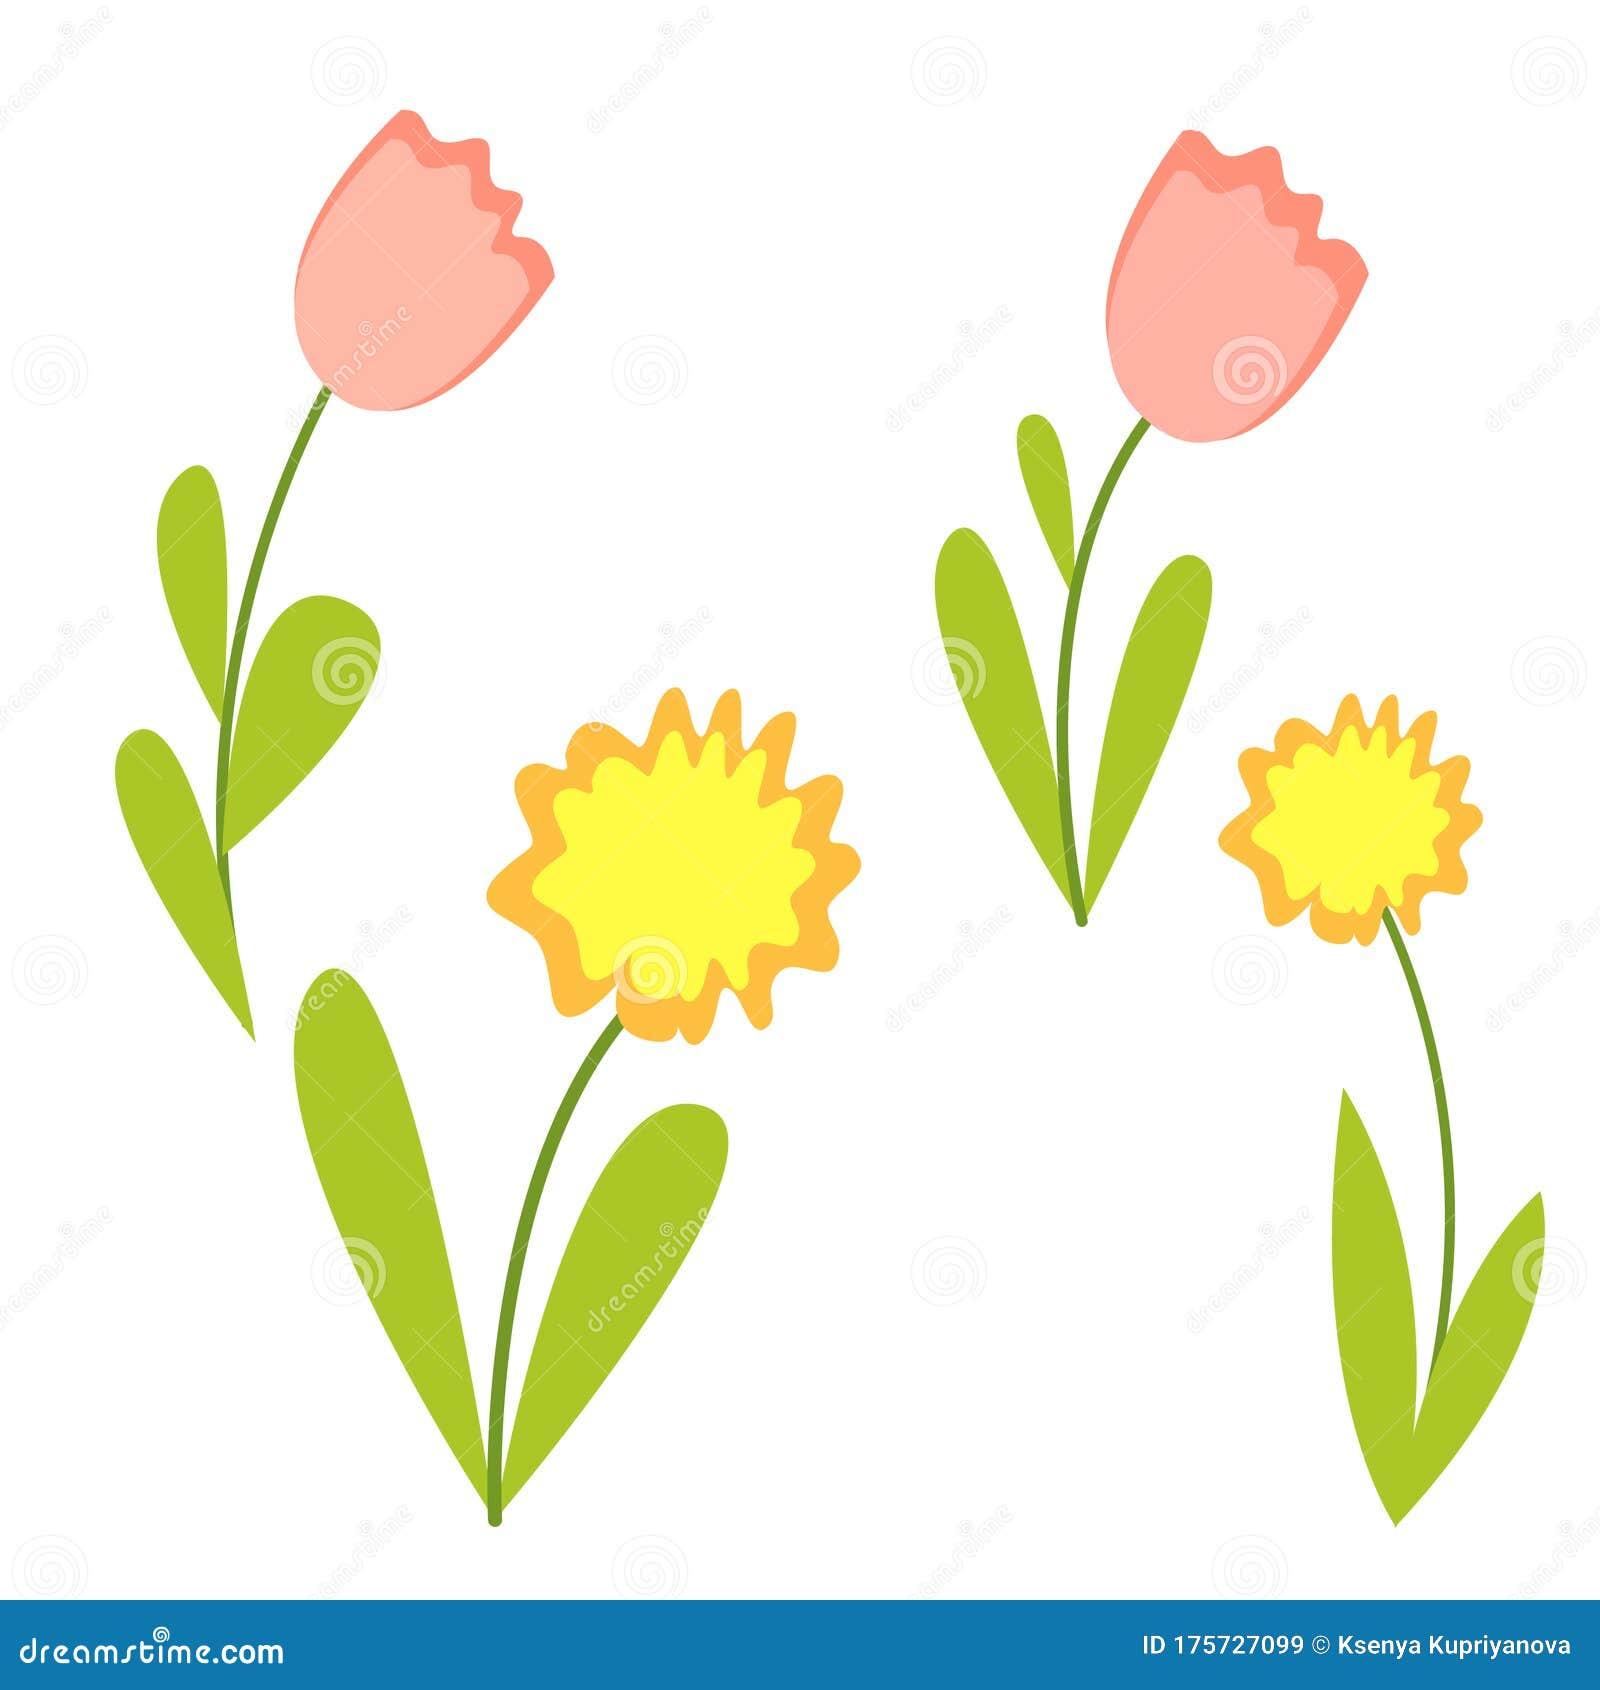 Cartoon Daffodils Flower Stock Illustrations 190 Cartoon Daffodils Flower Stock Illustrations Vectors Clipart Dreamstime